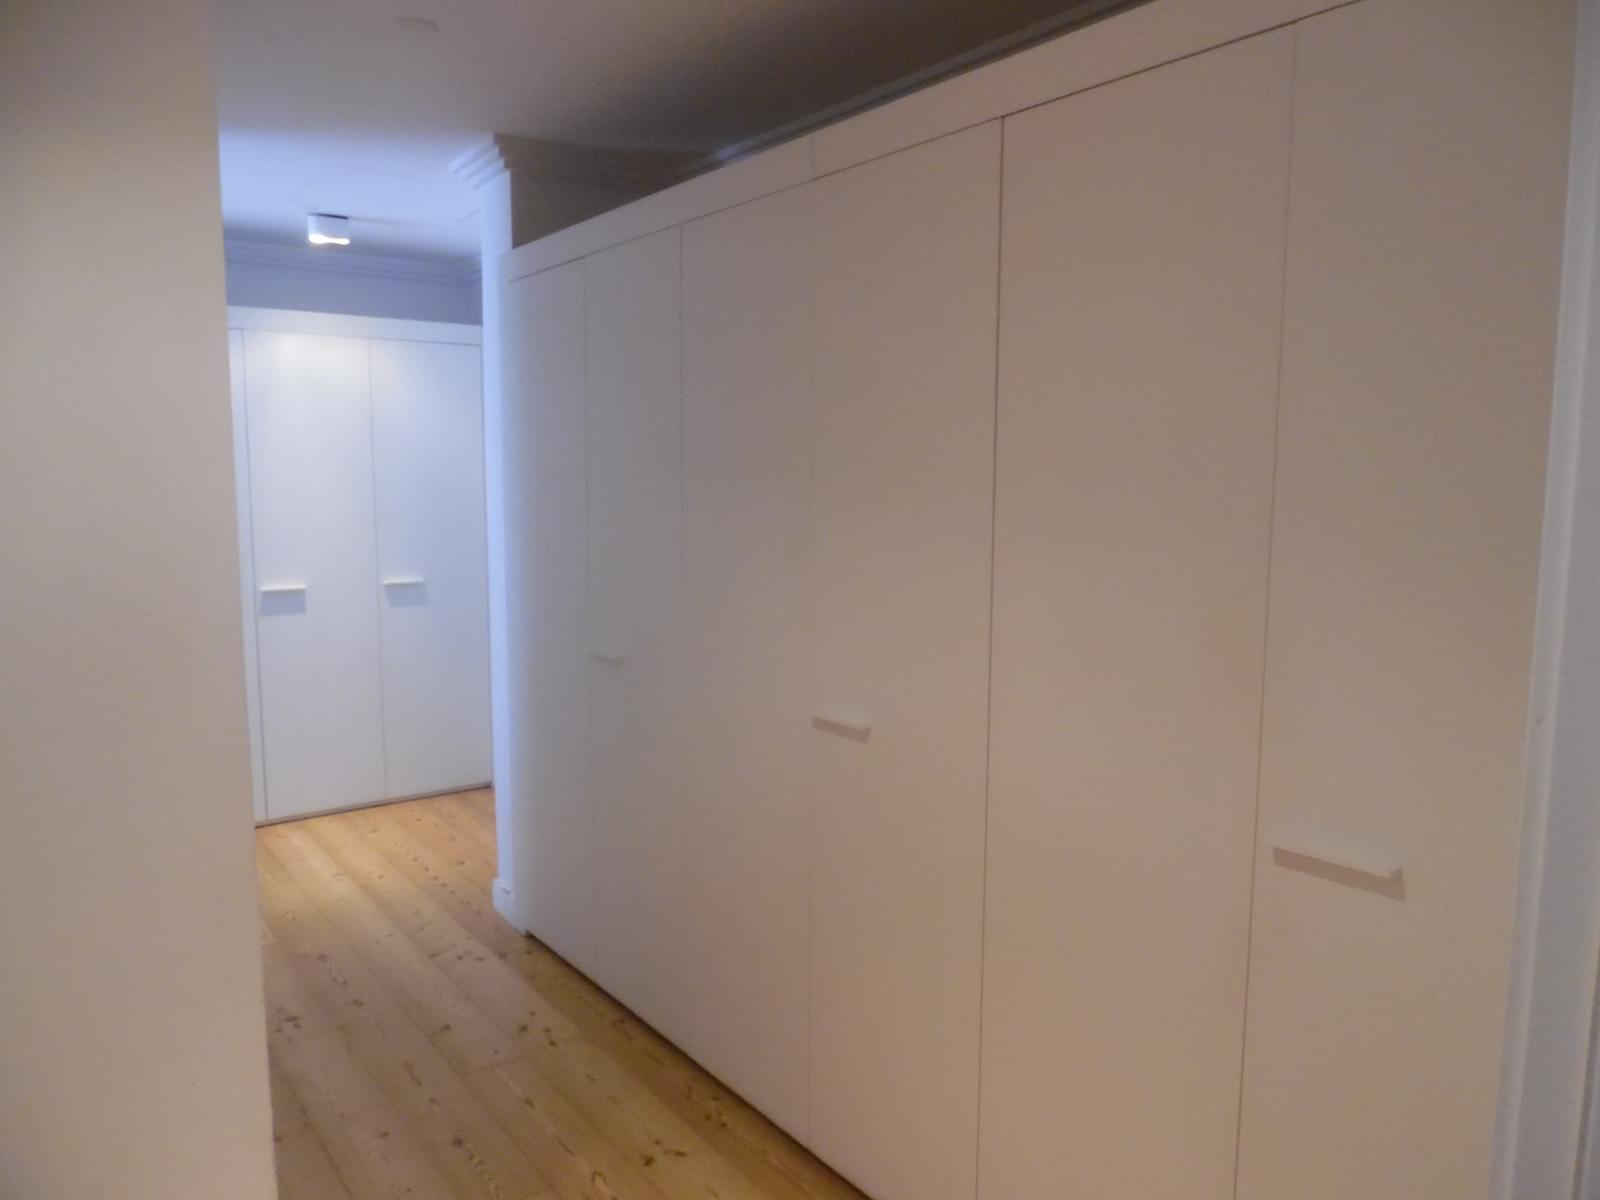 pf17454-apartamento-t4-lisboa-8604a8a7-54cb-4cd1-b711-357b77aba2a7